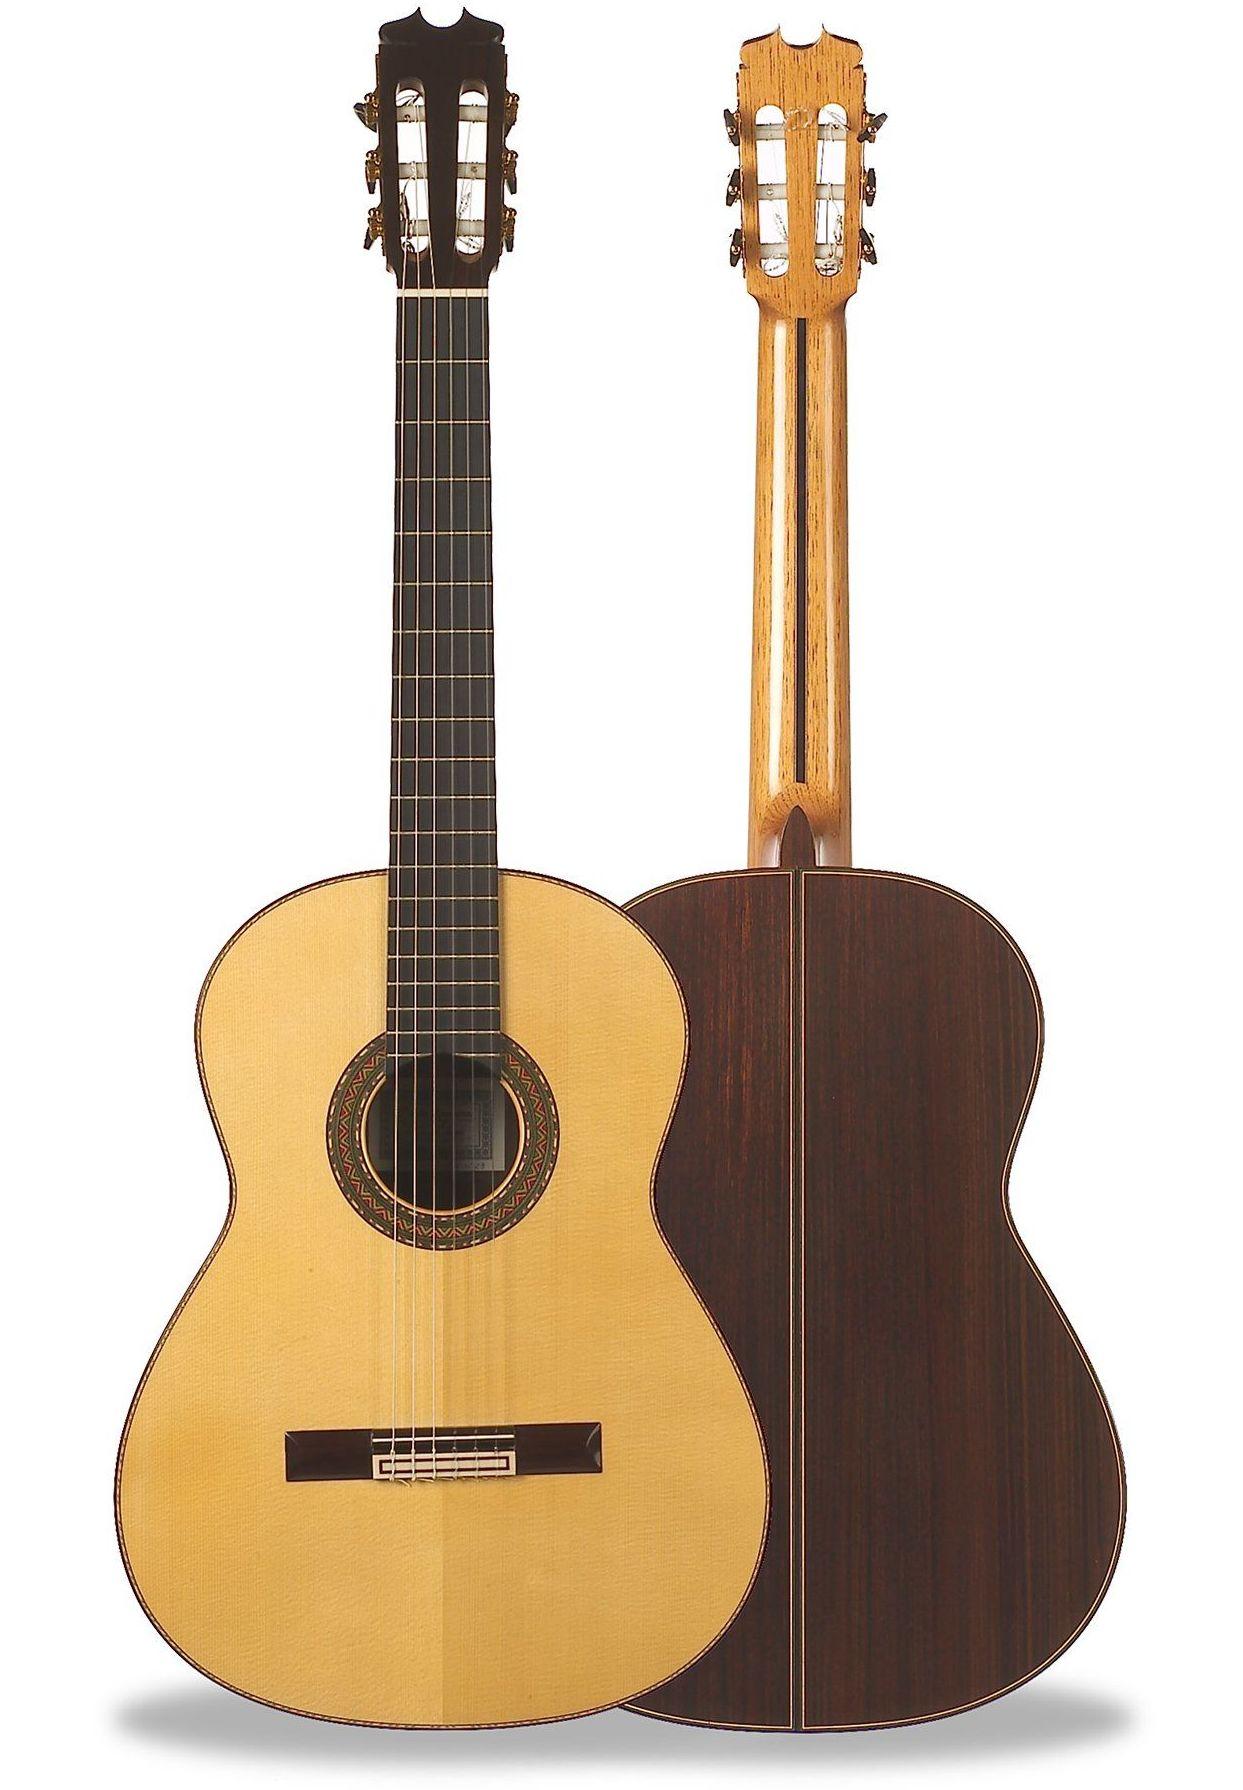 Guitarras españolas Ciutat Vella